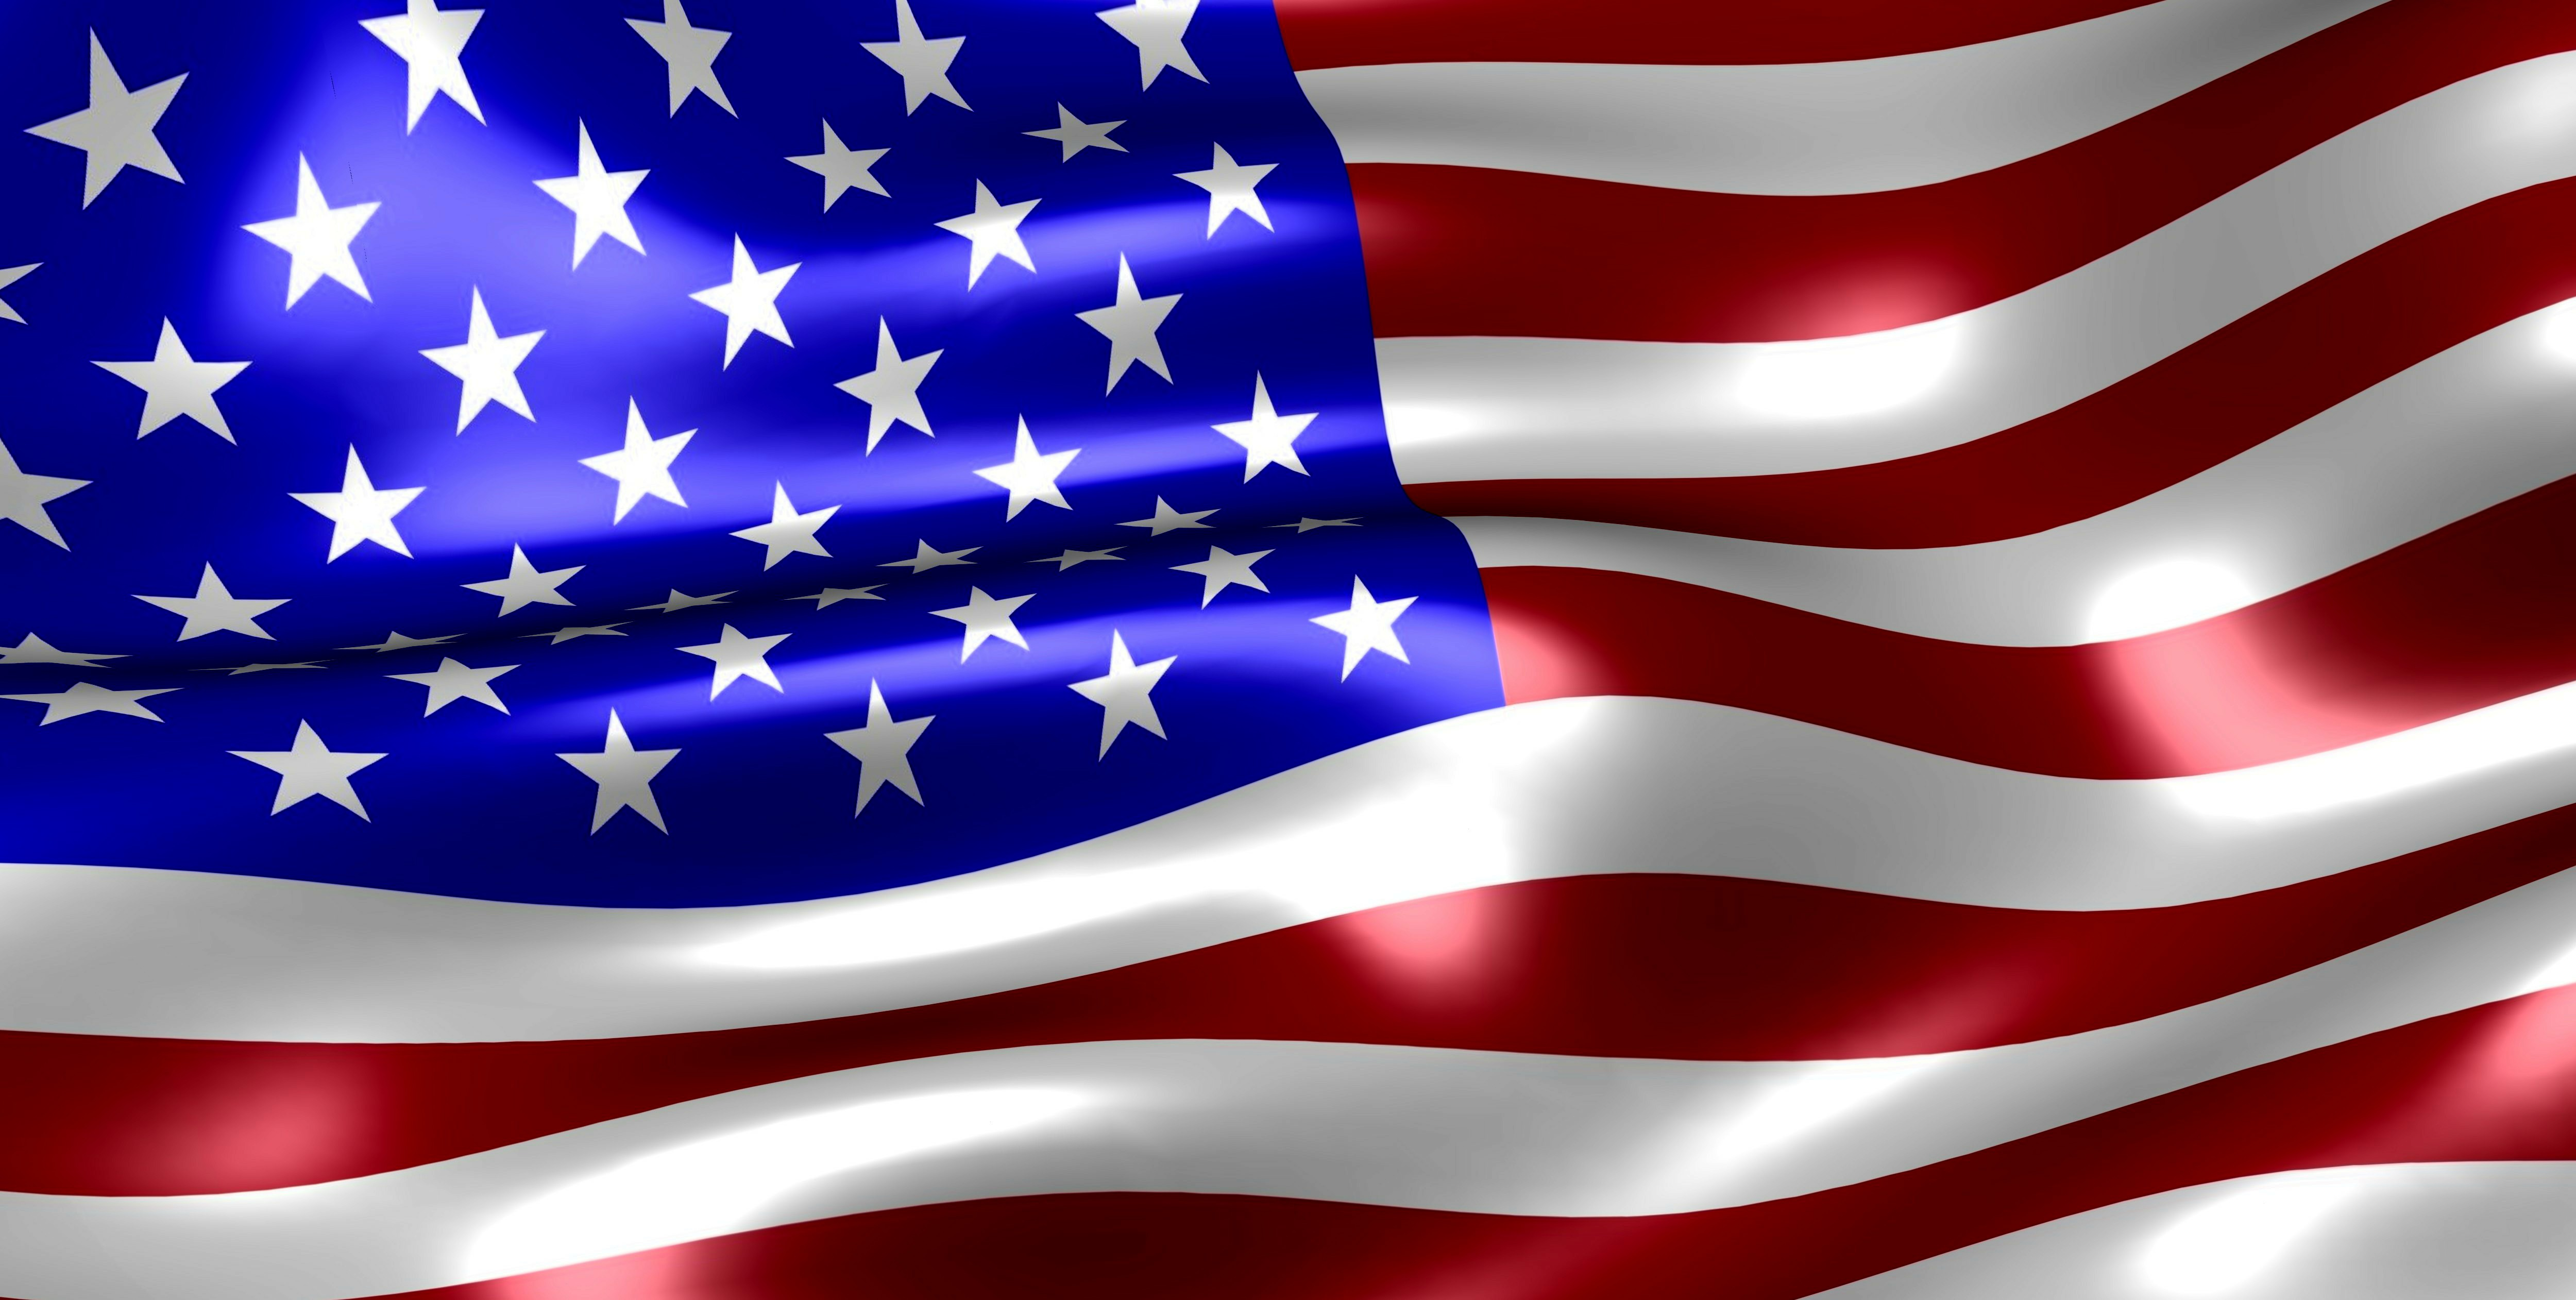 USA Flag Wallpaper HD